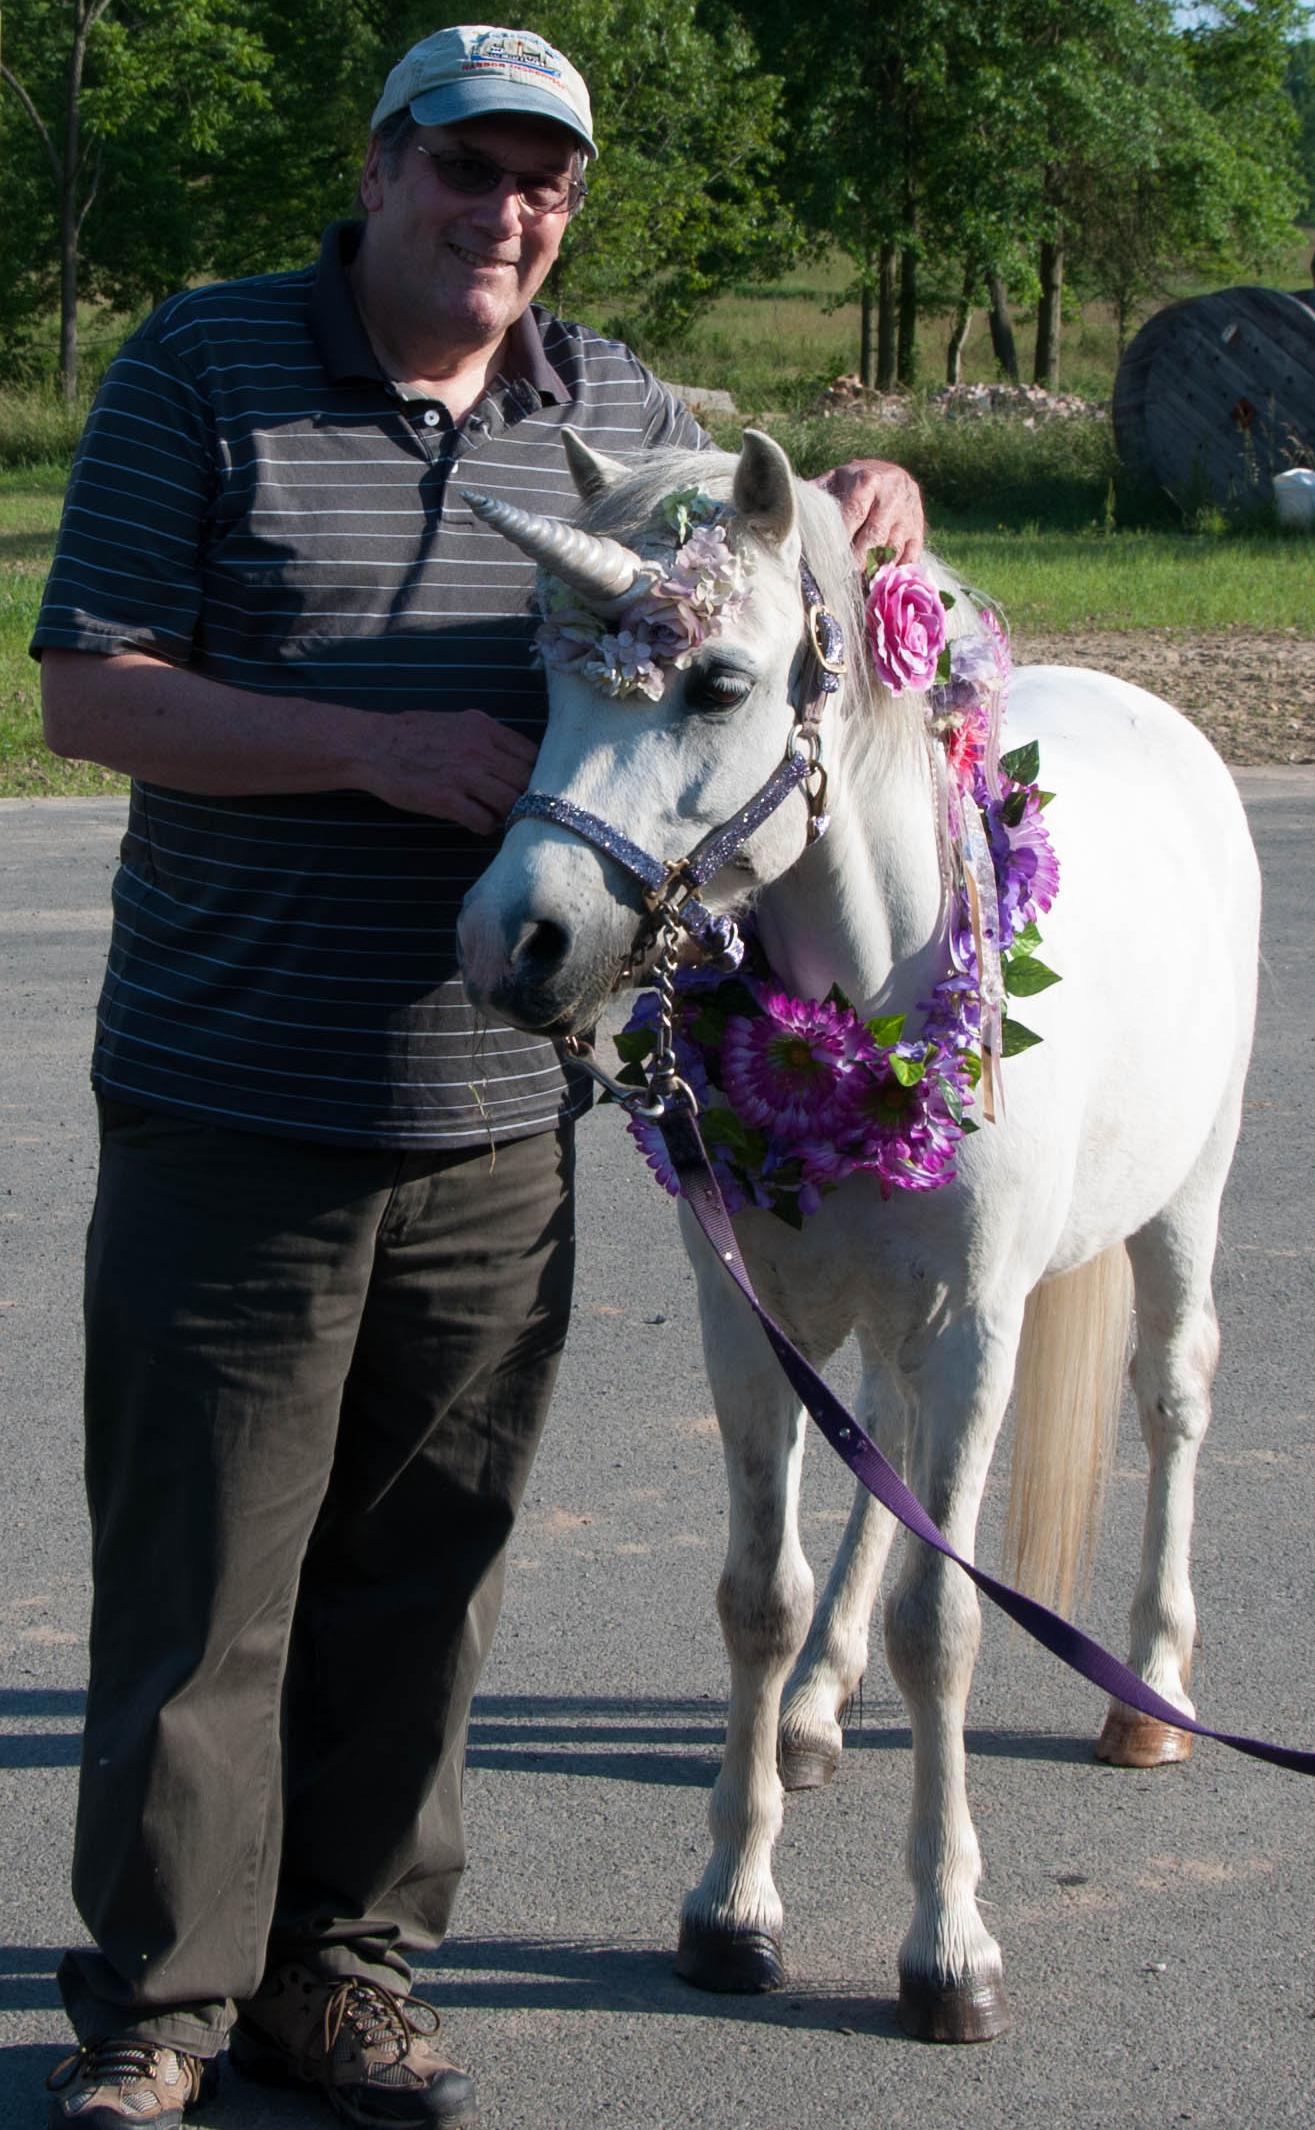 David and a unicorn June 10, 2017